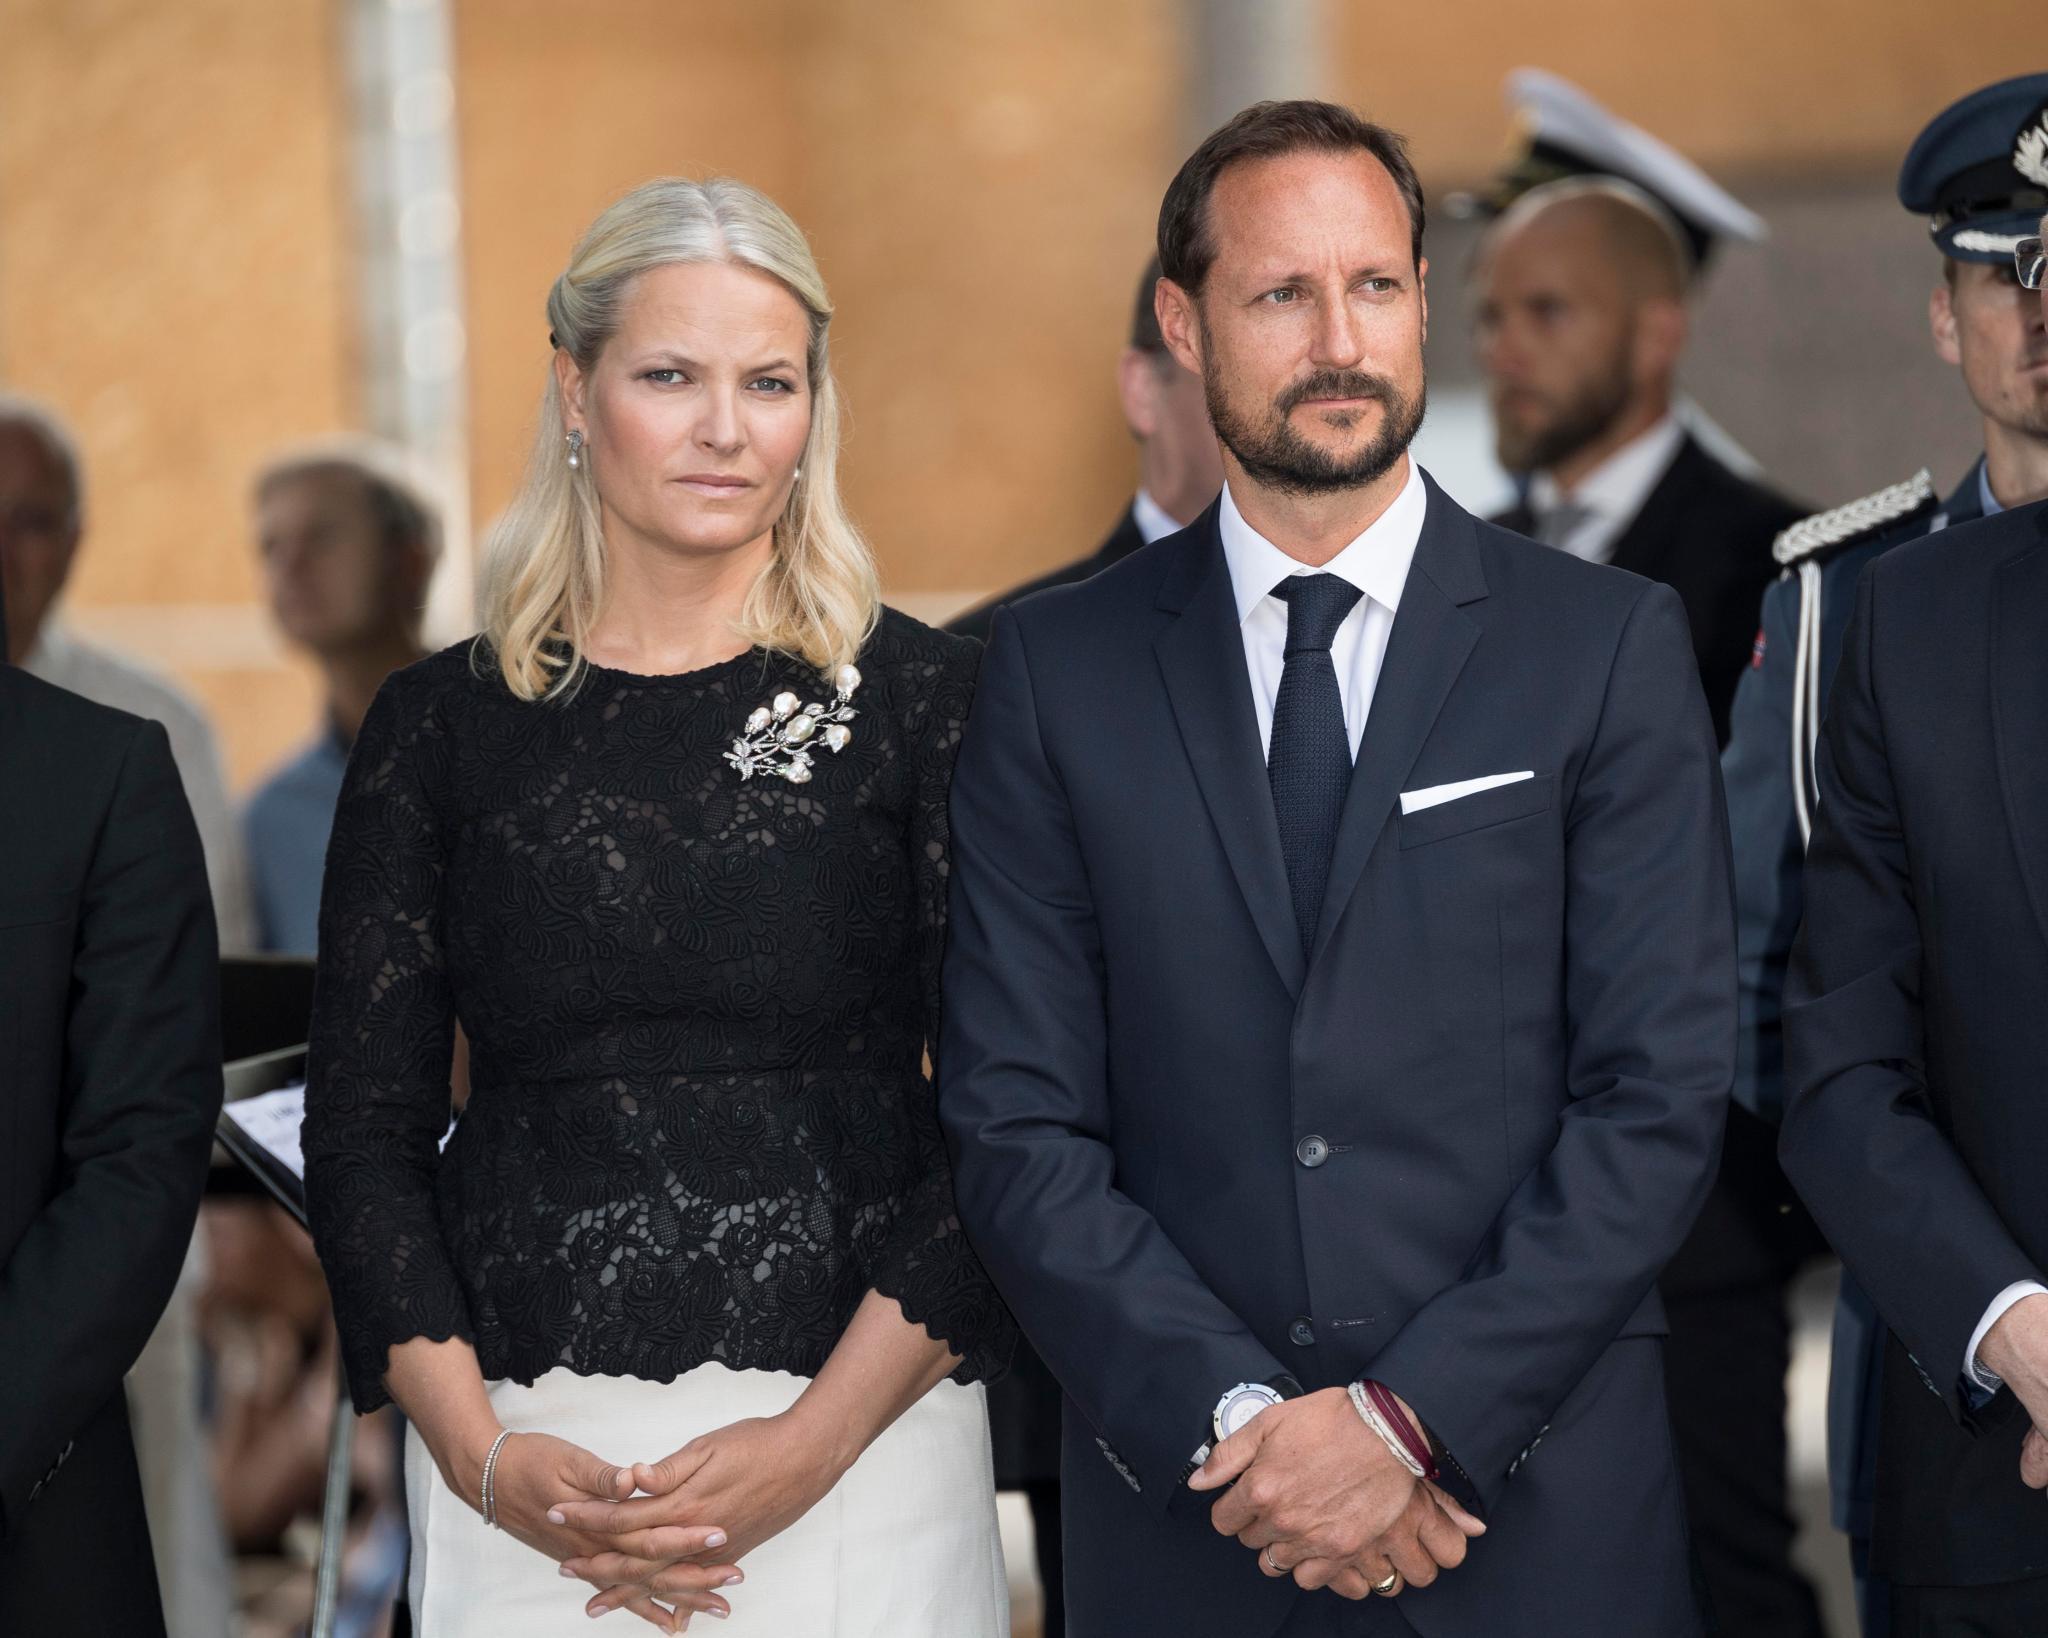 Prinzessin Mette-Marit + Prinz Haakon